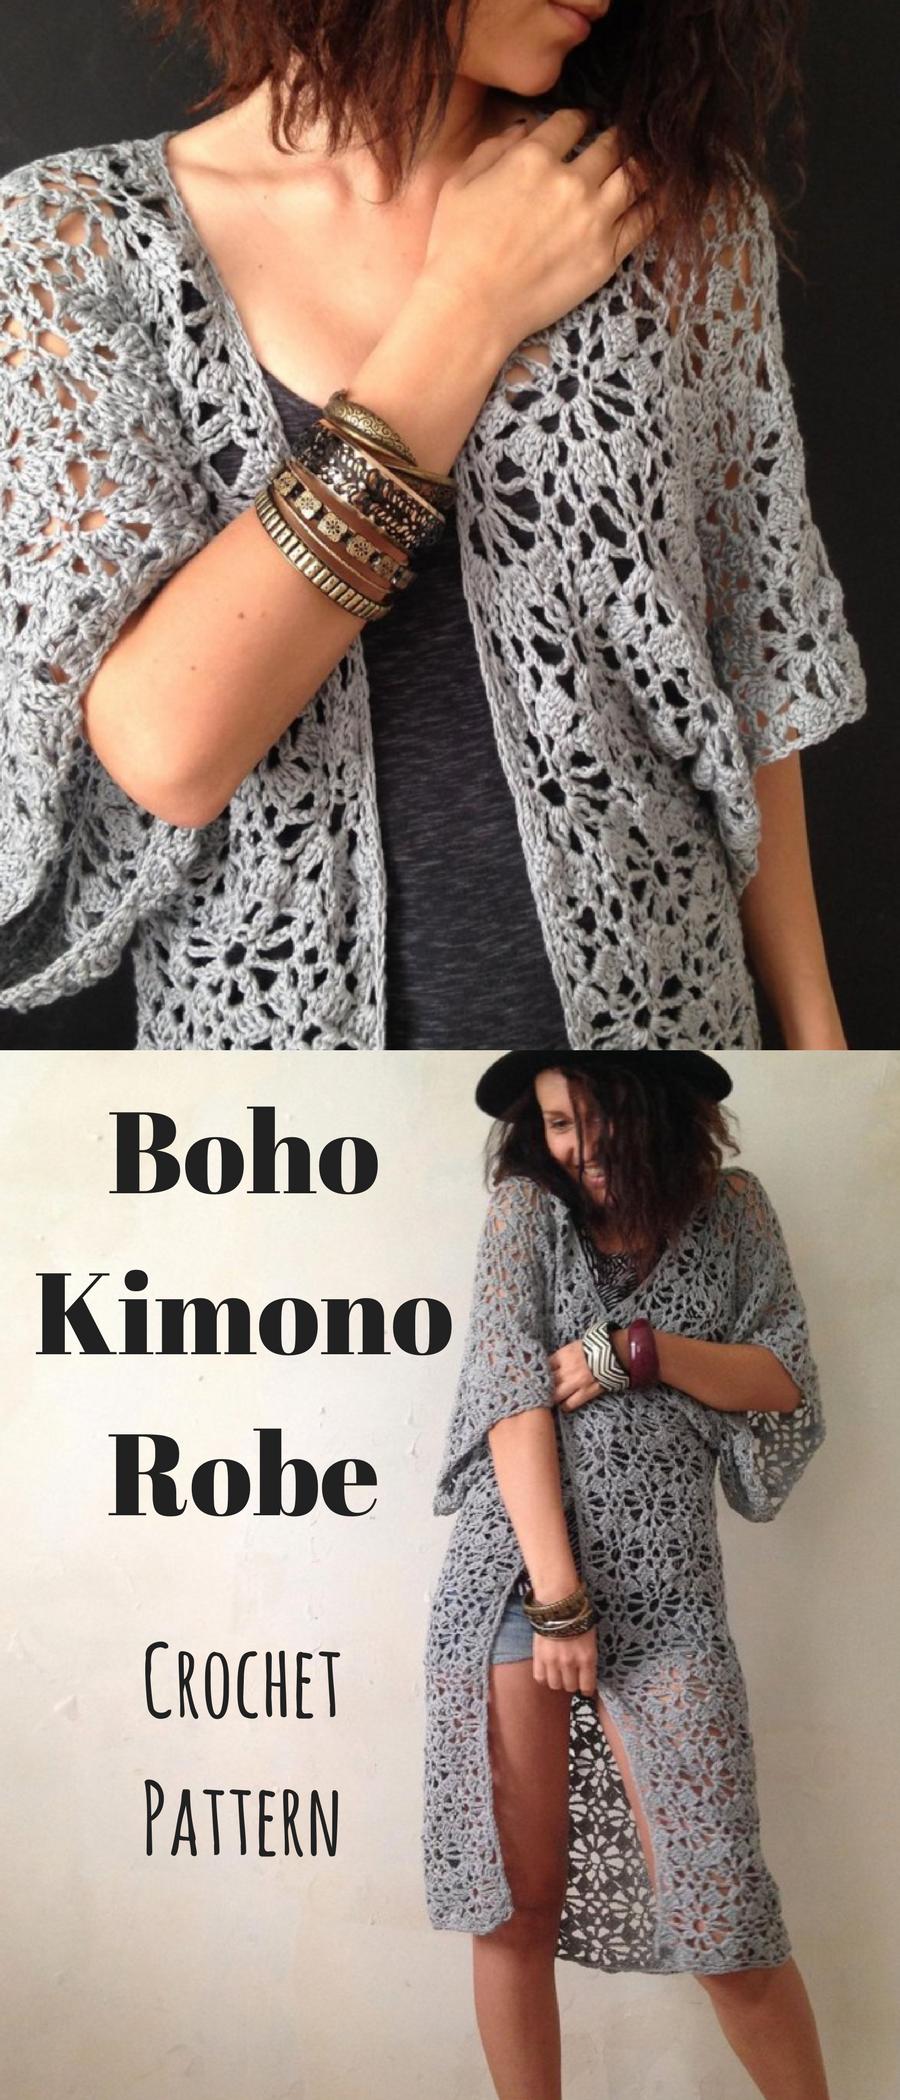 Boho Crochet Robe Crochet pattern by ElevenHandmade #crochetclothes